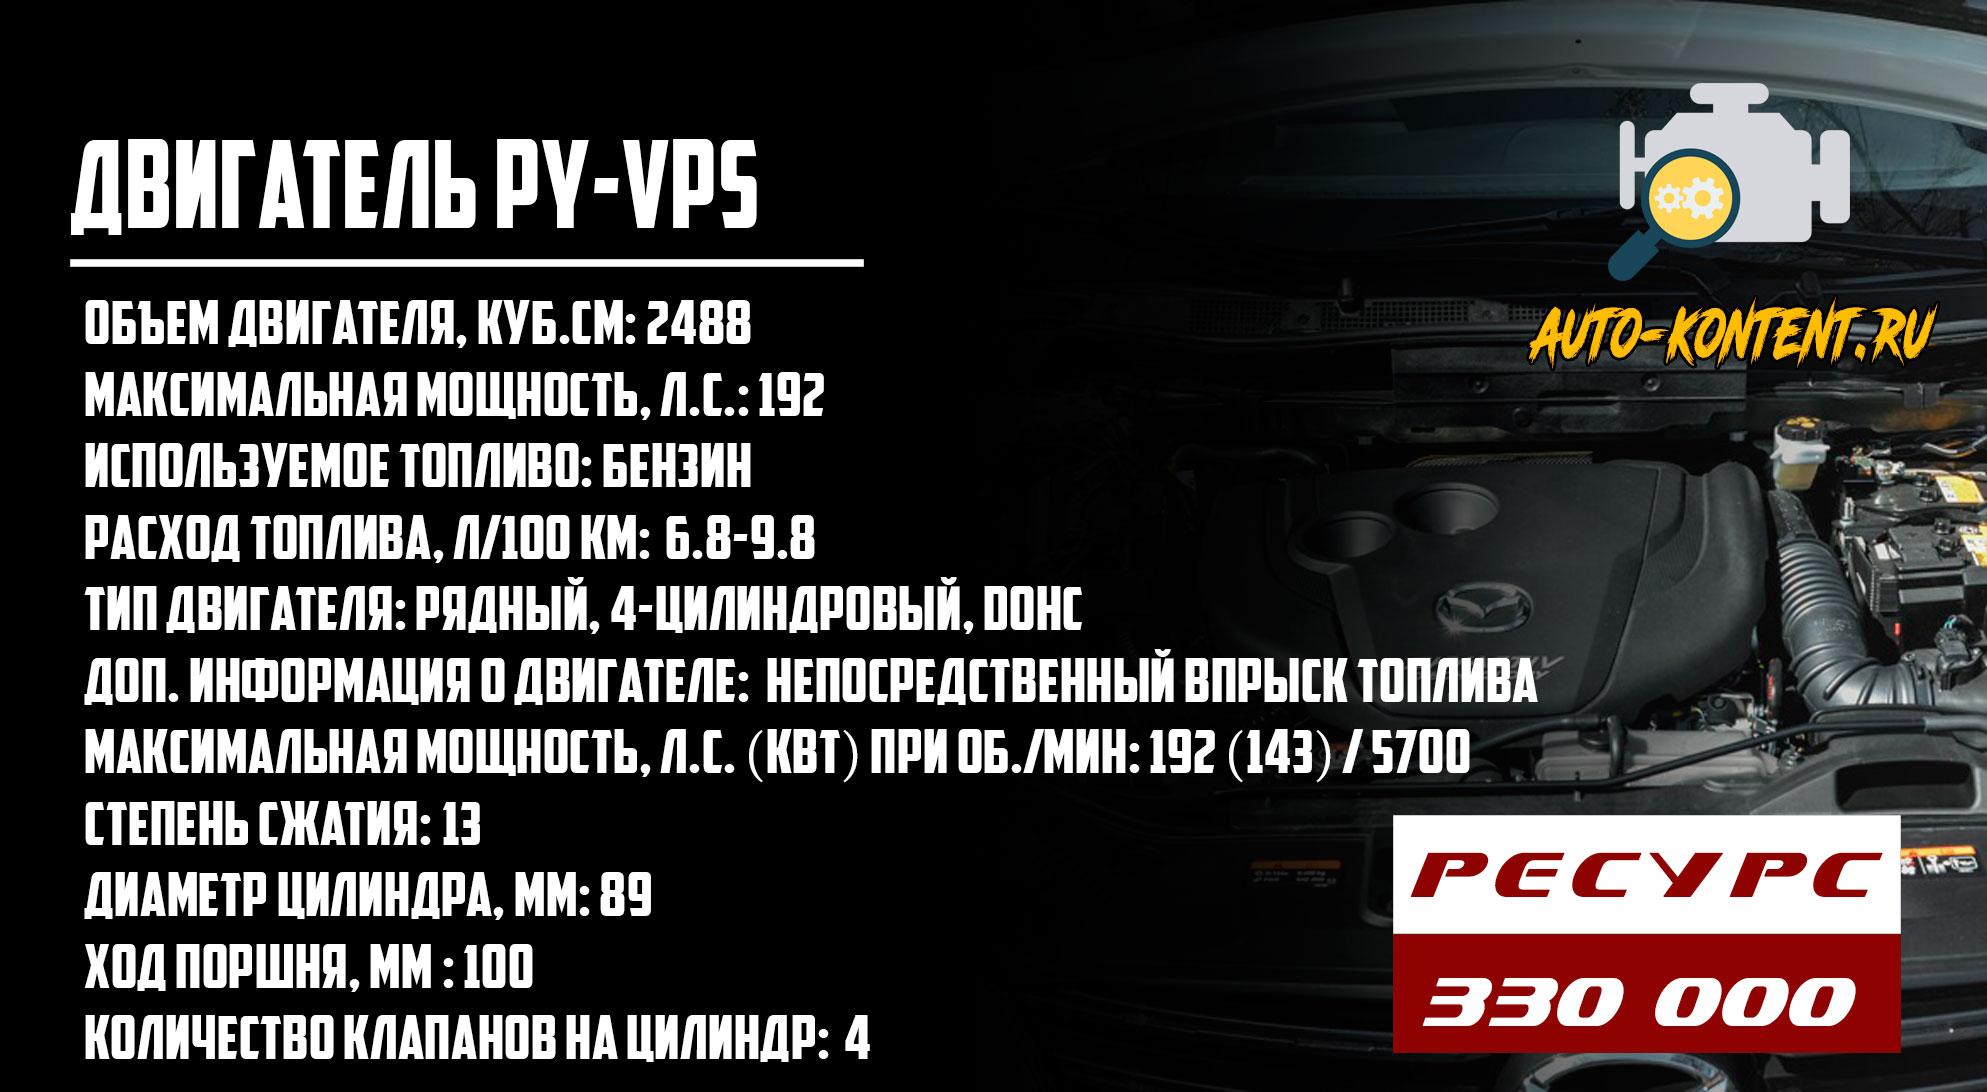 PY-VPS